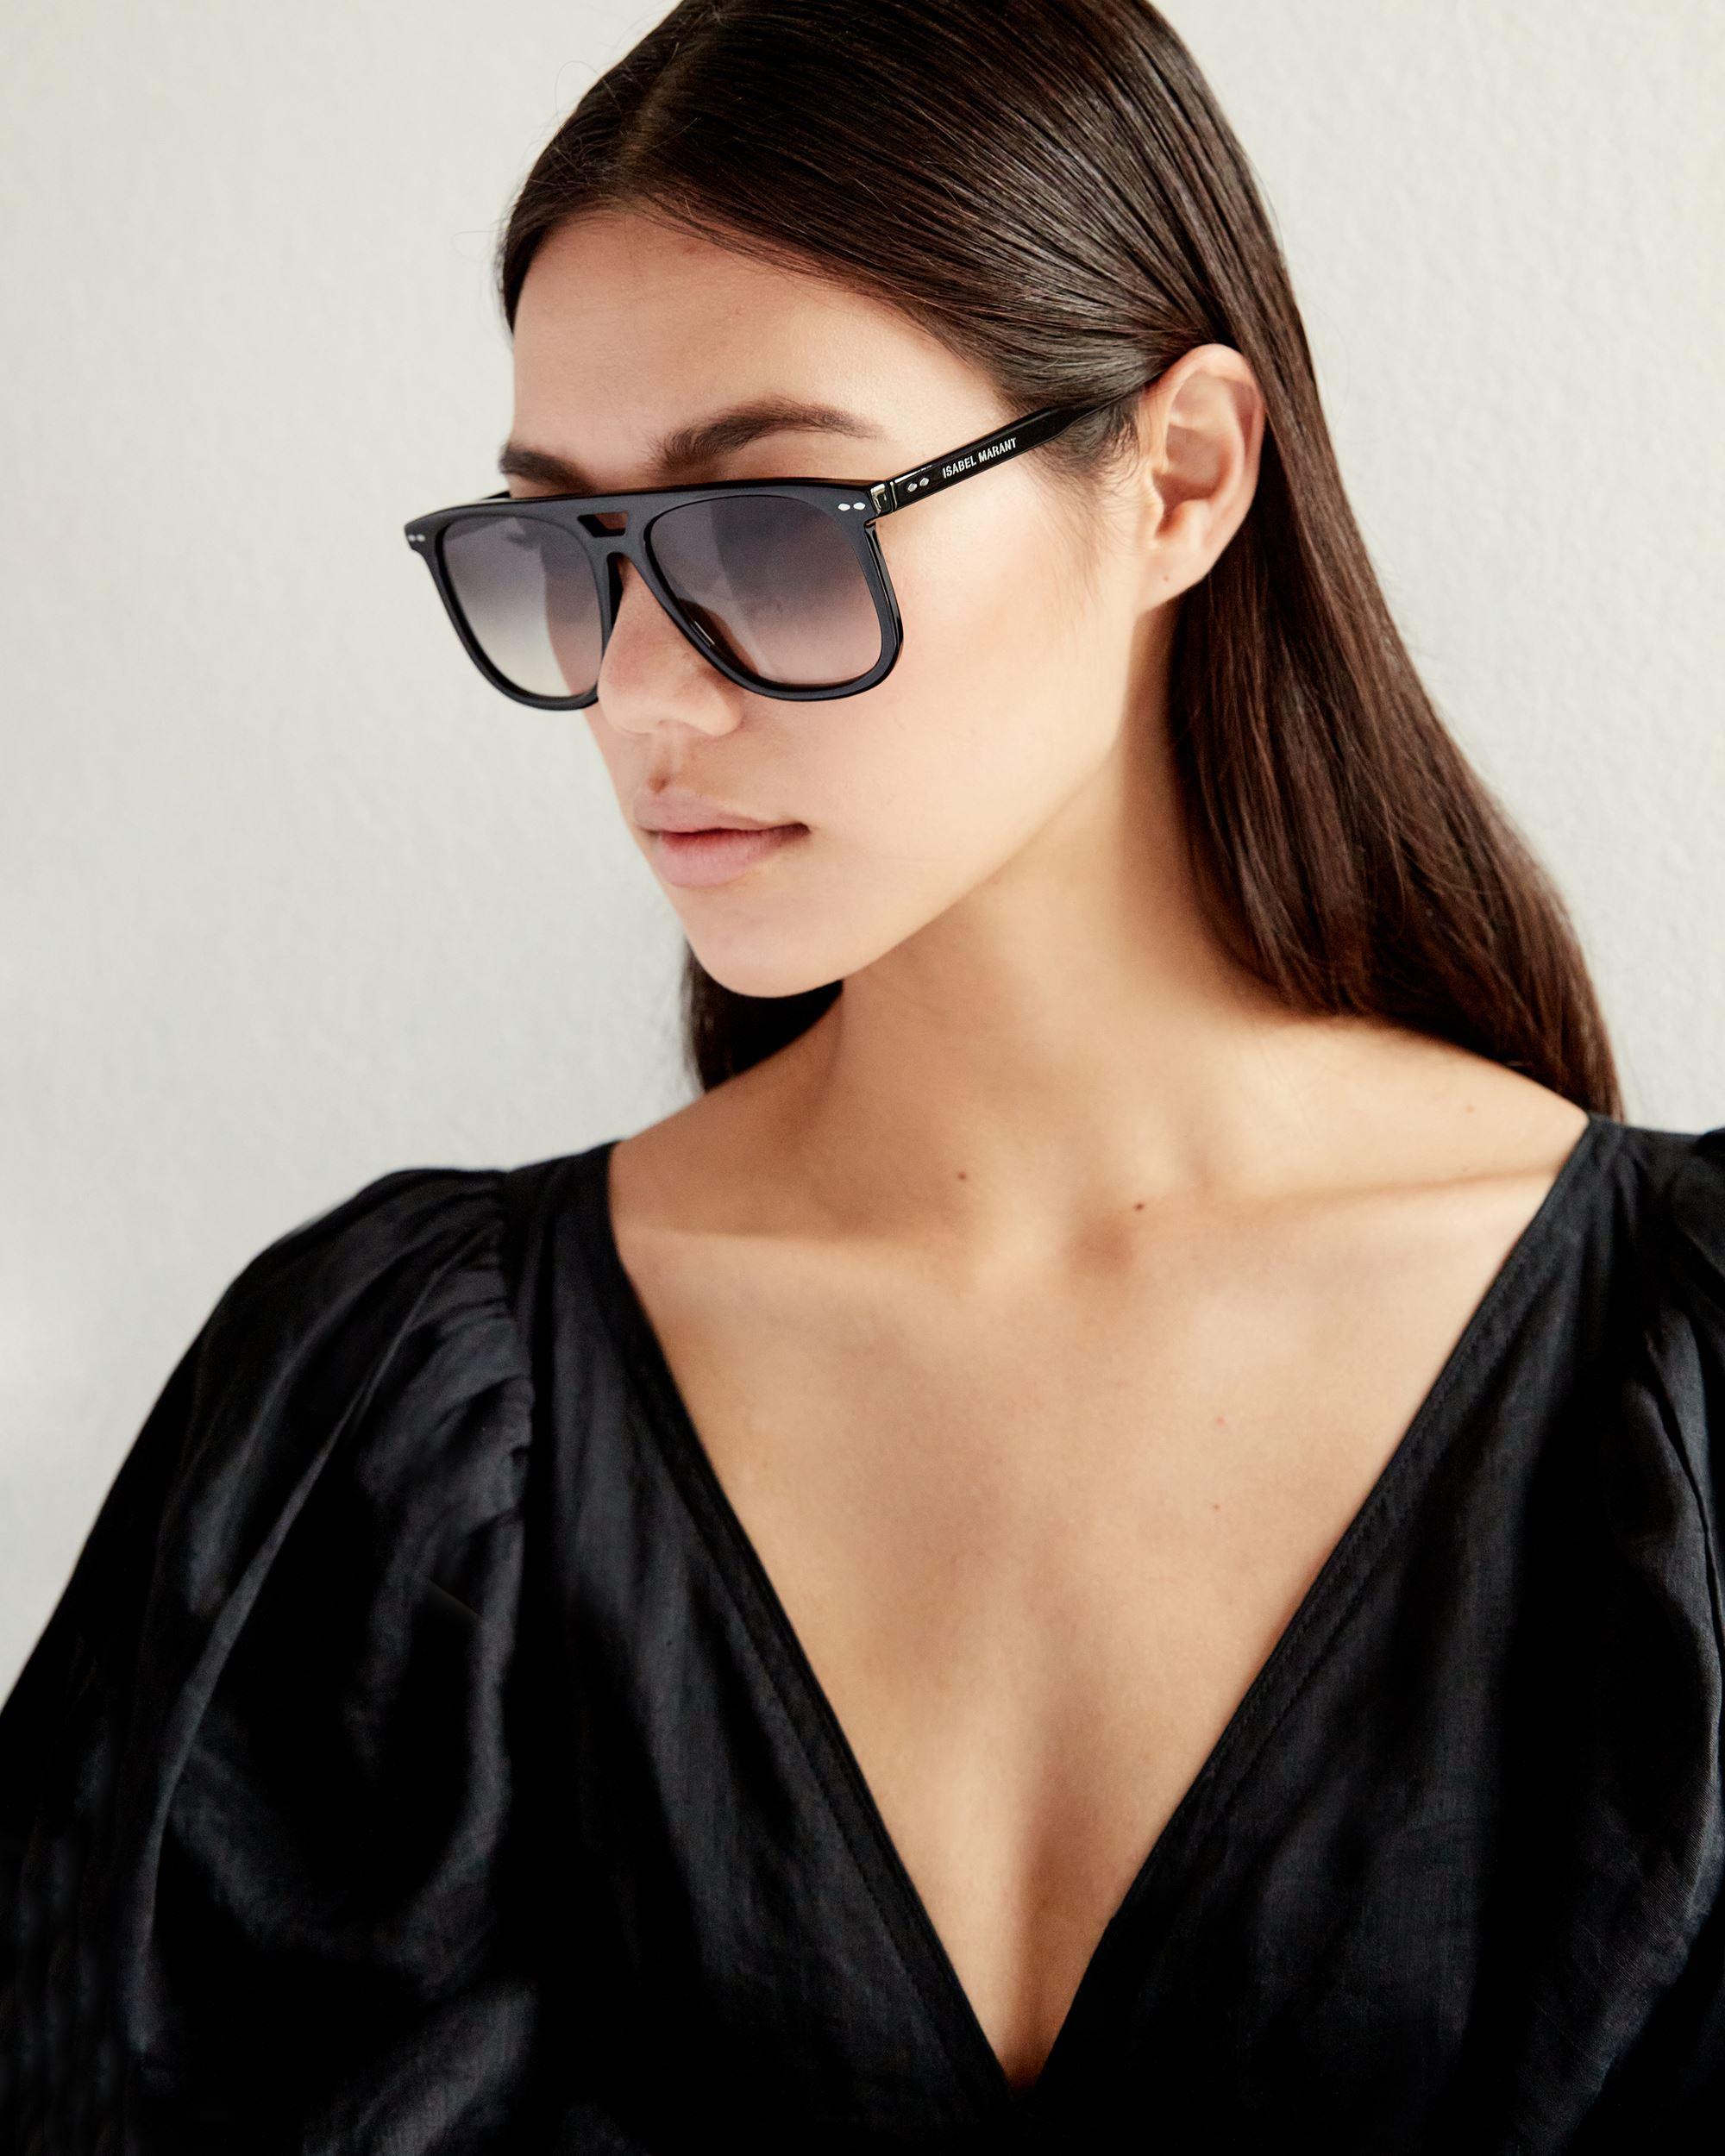 Sonnenbrille, Nima, Isabel Marant, Aviator, Sumer 2021